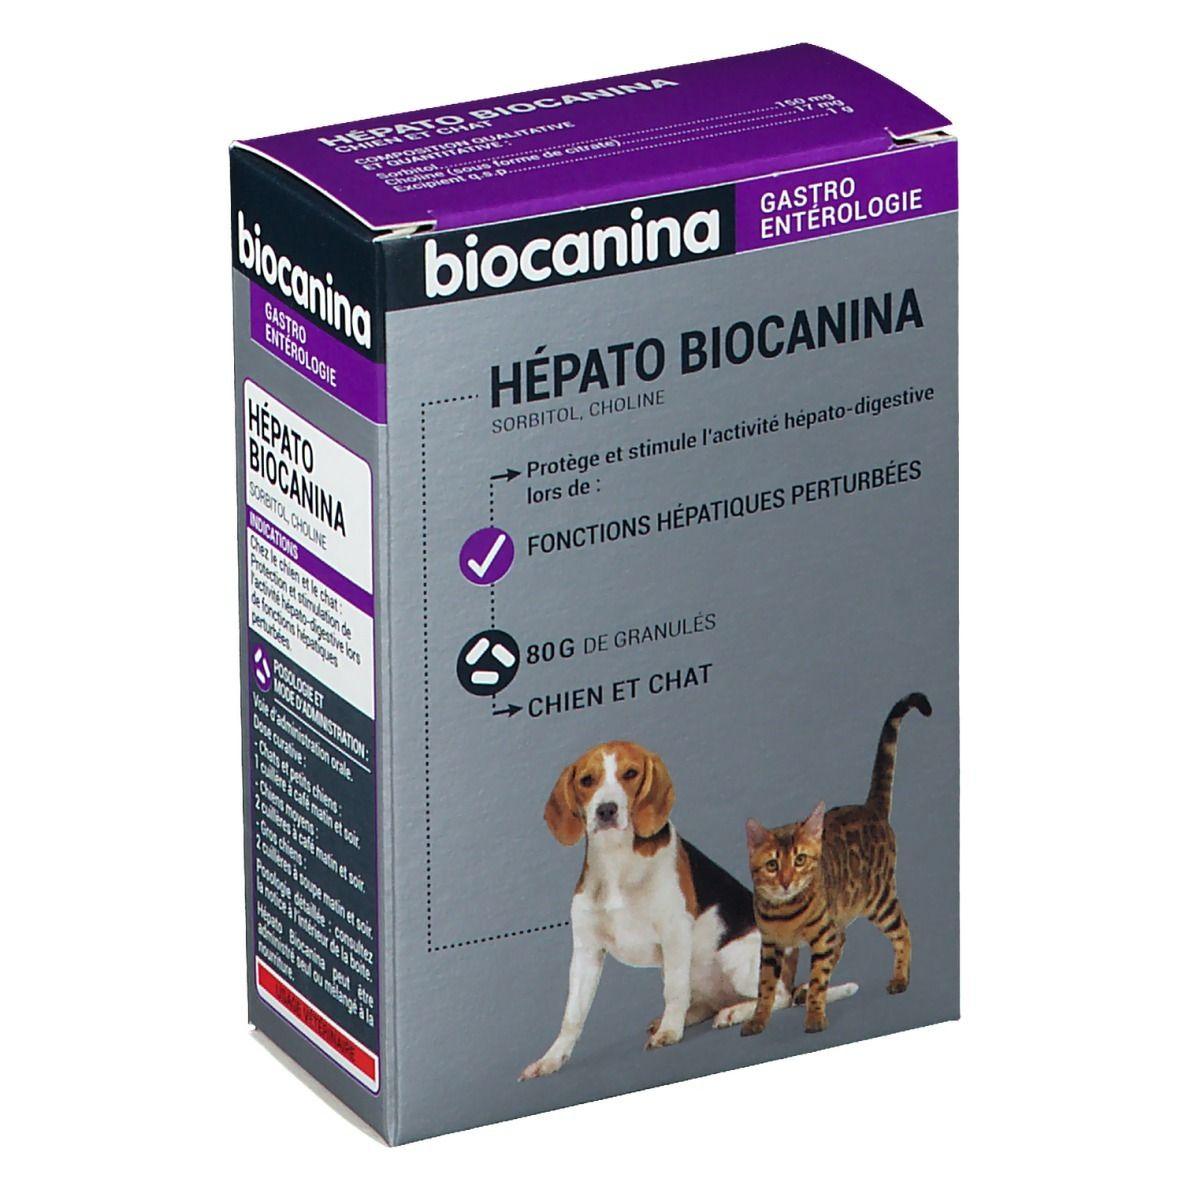 Image of biocanina Hépato Biocanina